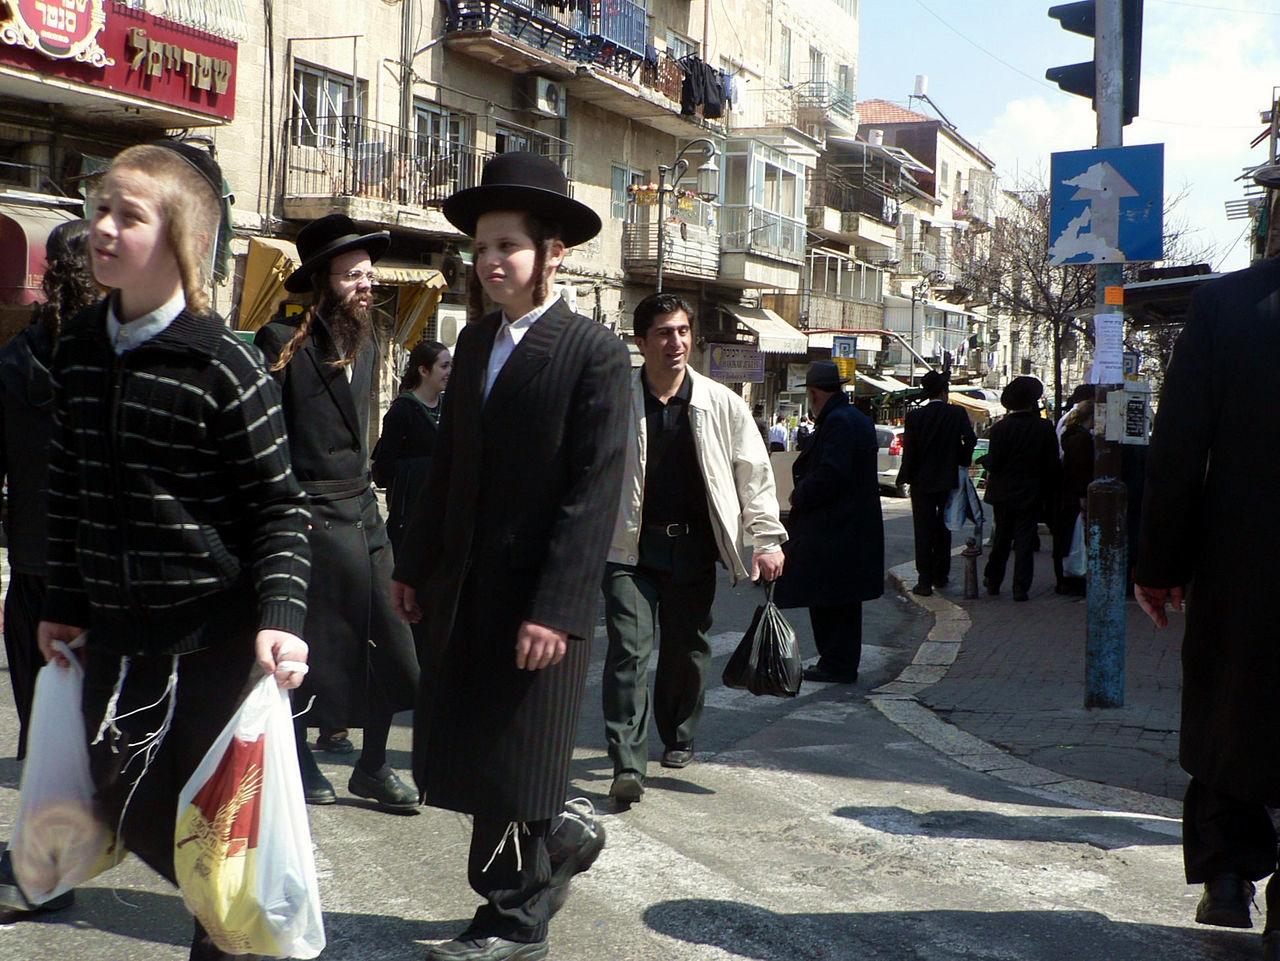 Mea-shearim-neighborhood-Jerusalem